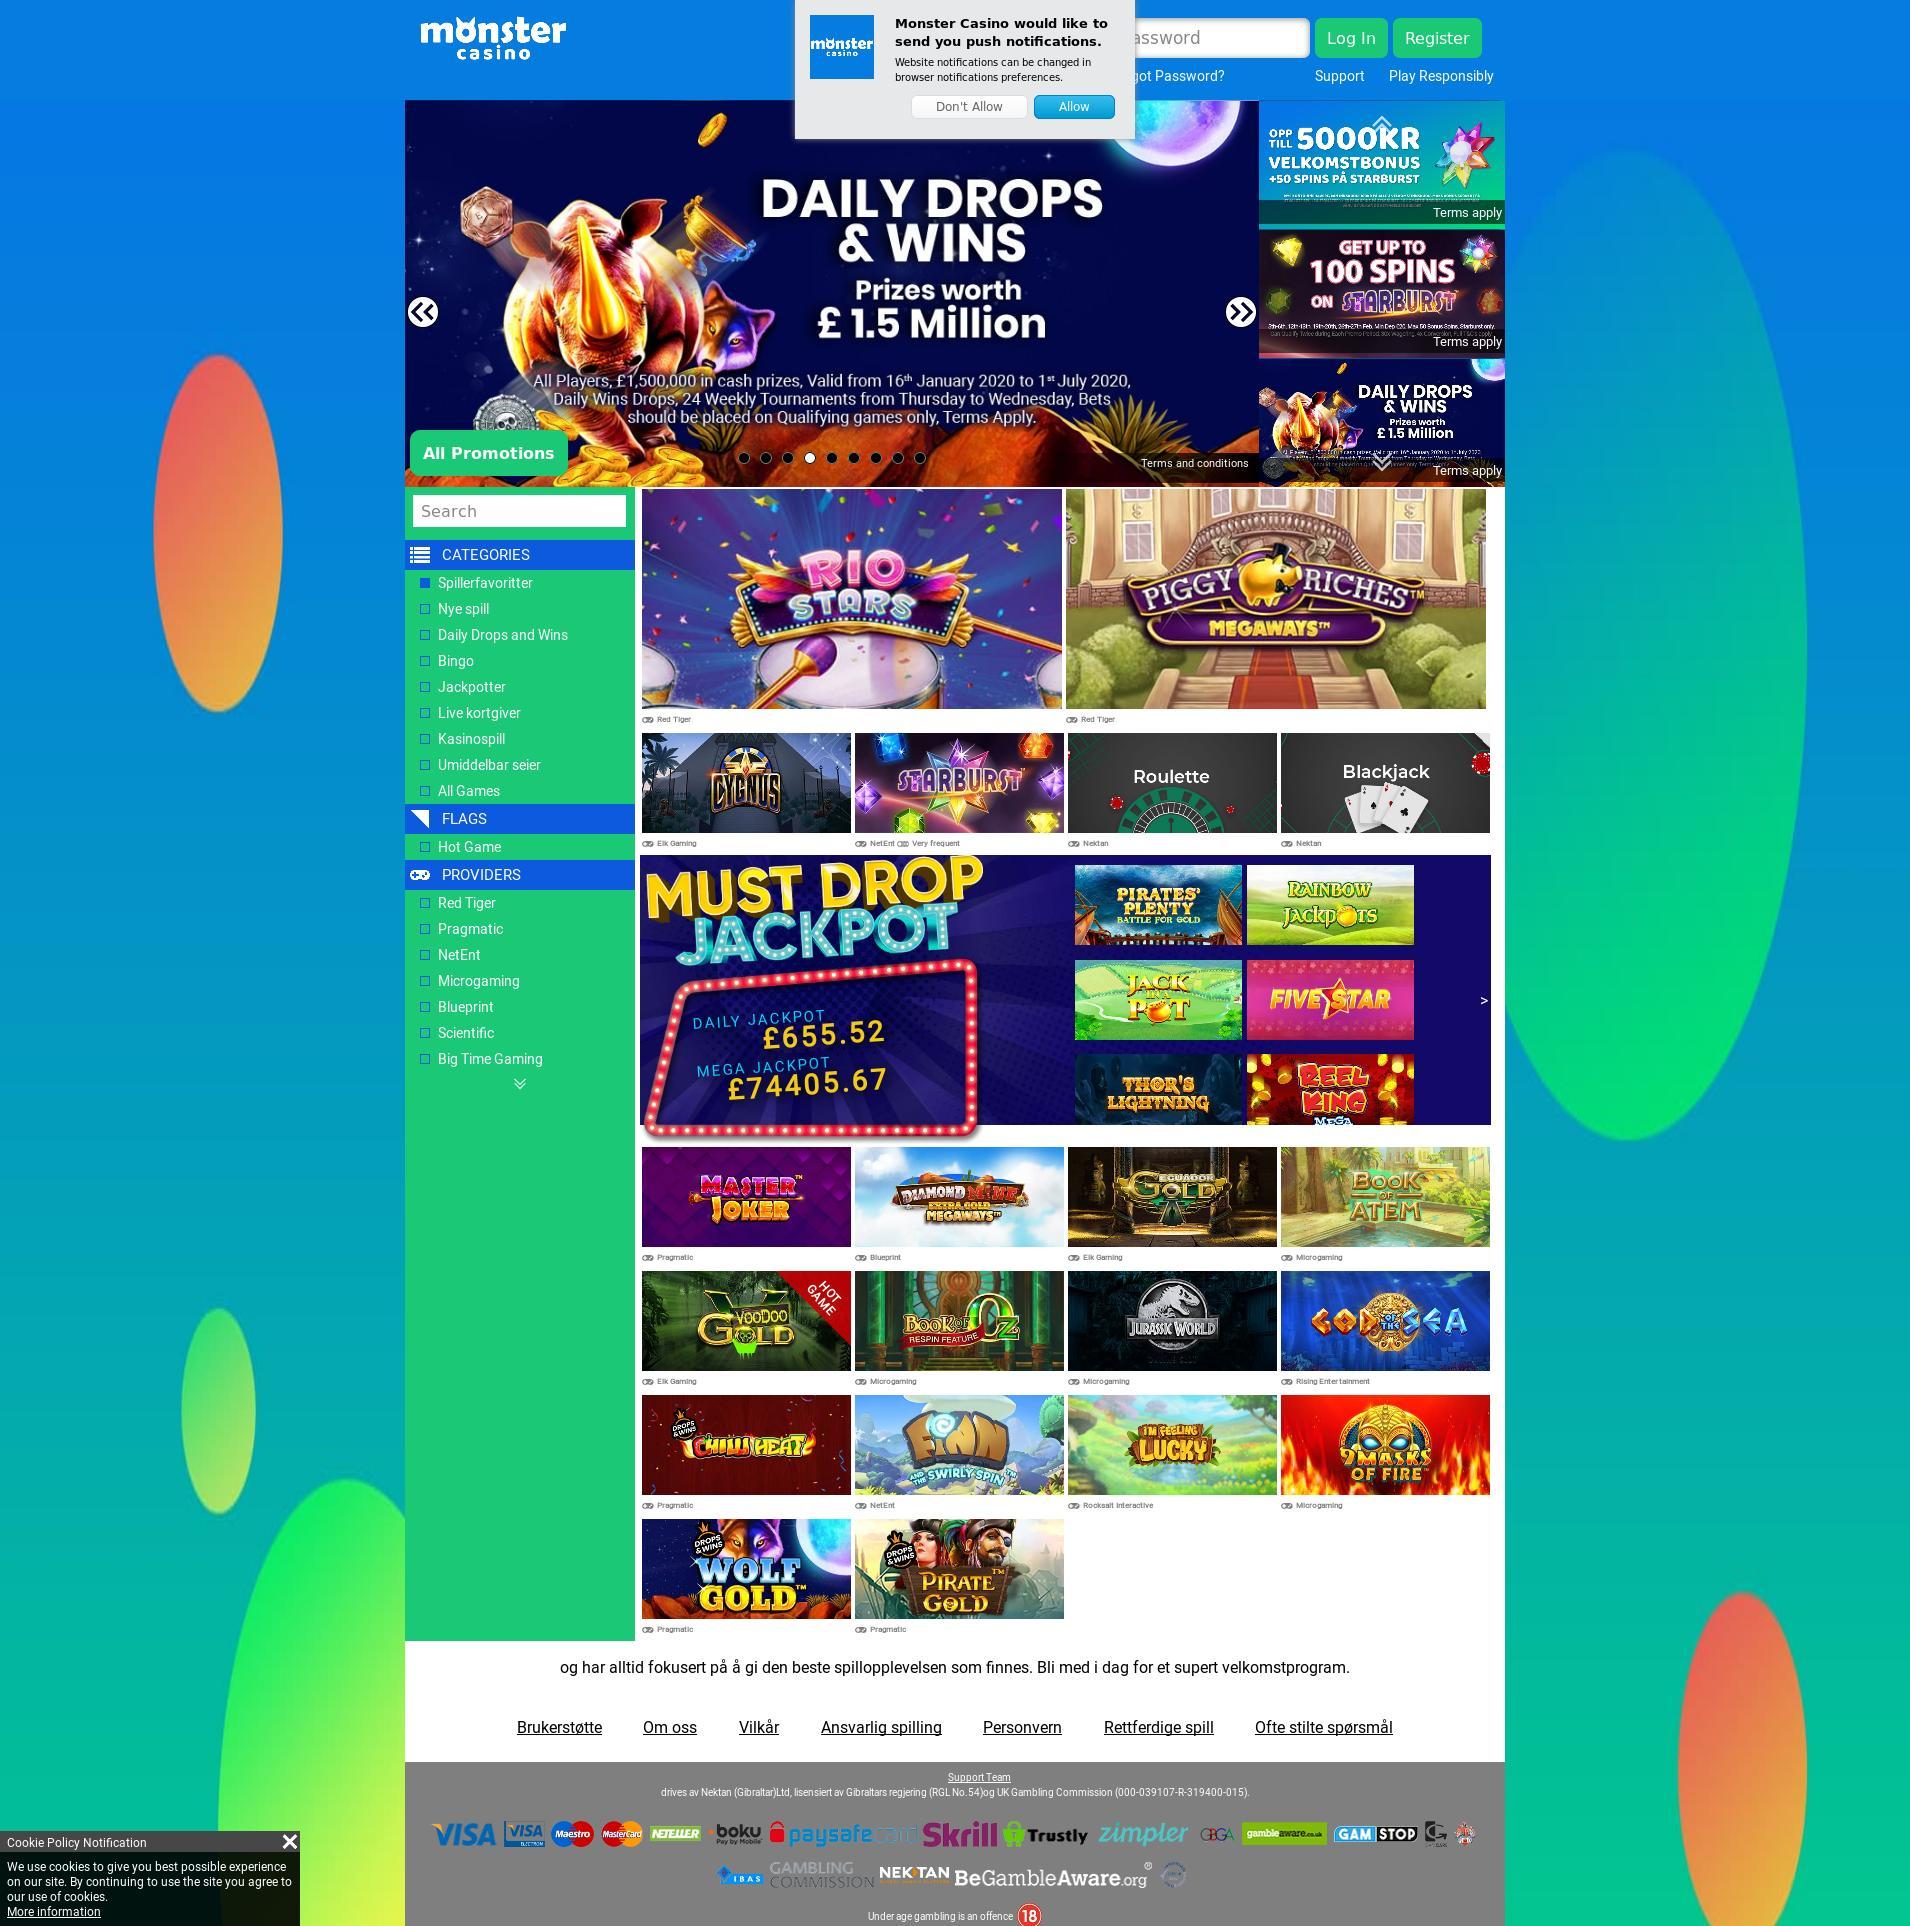 Casino screen Lobby 2020-02-20 for Norway